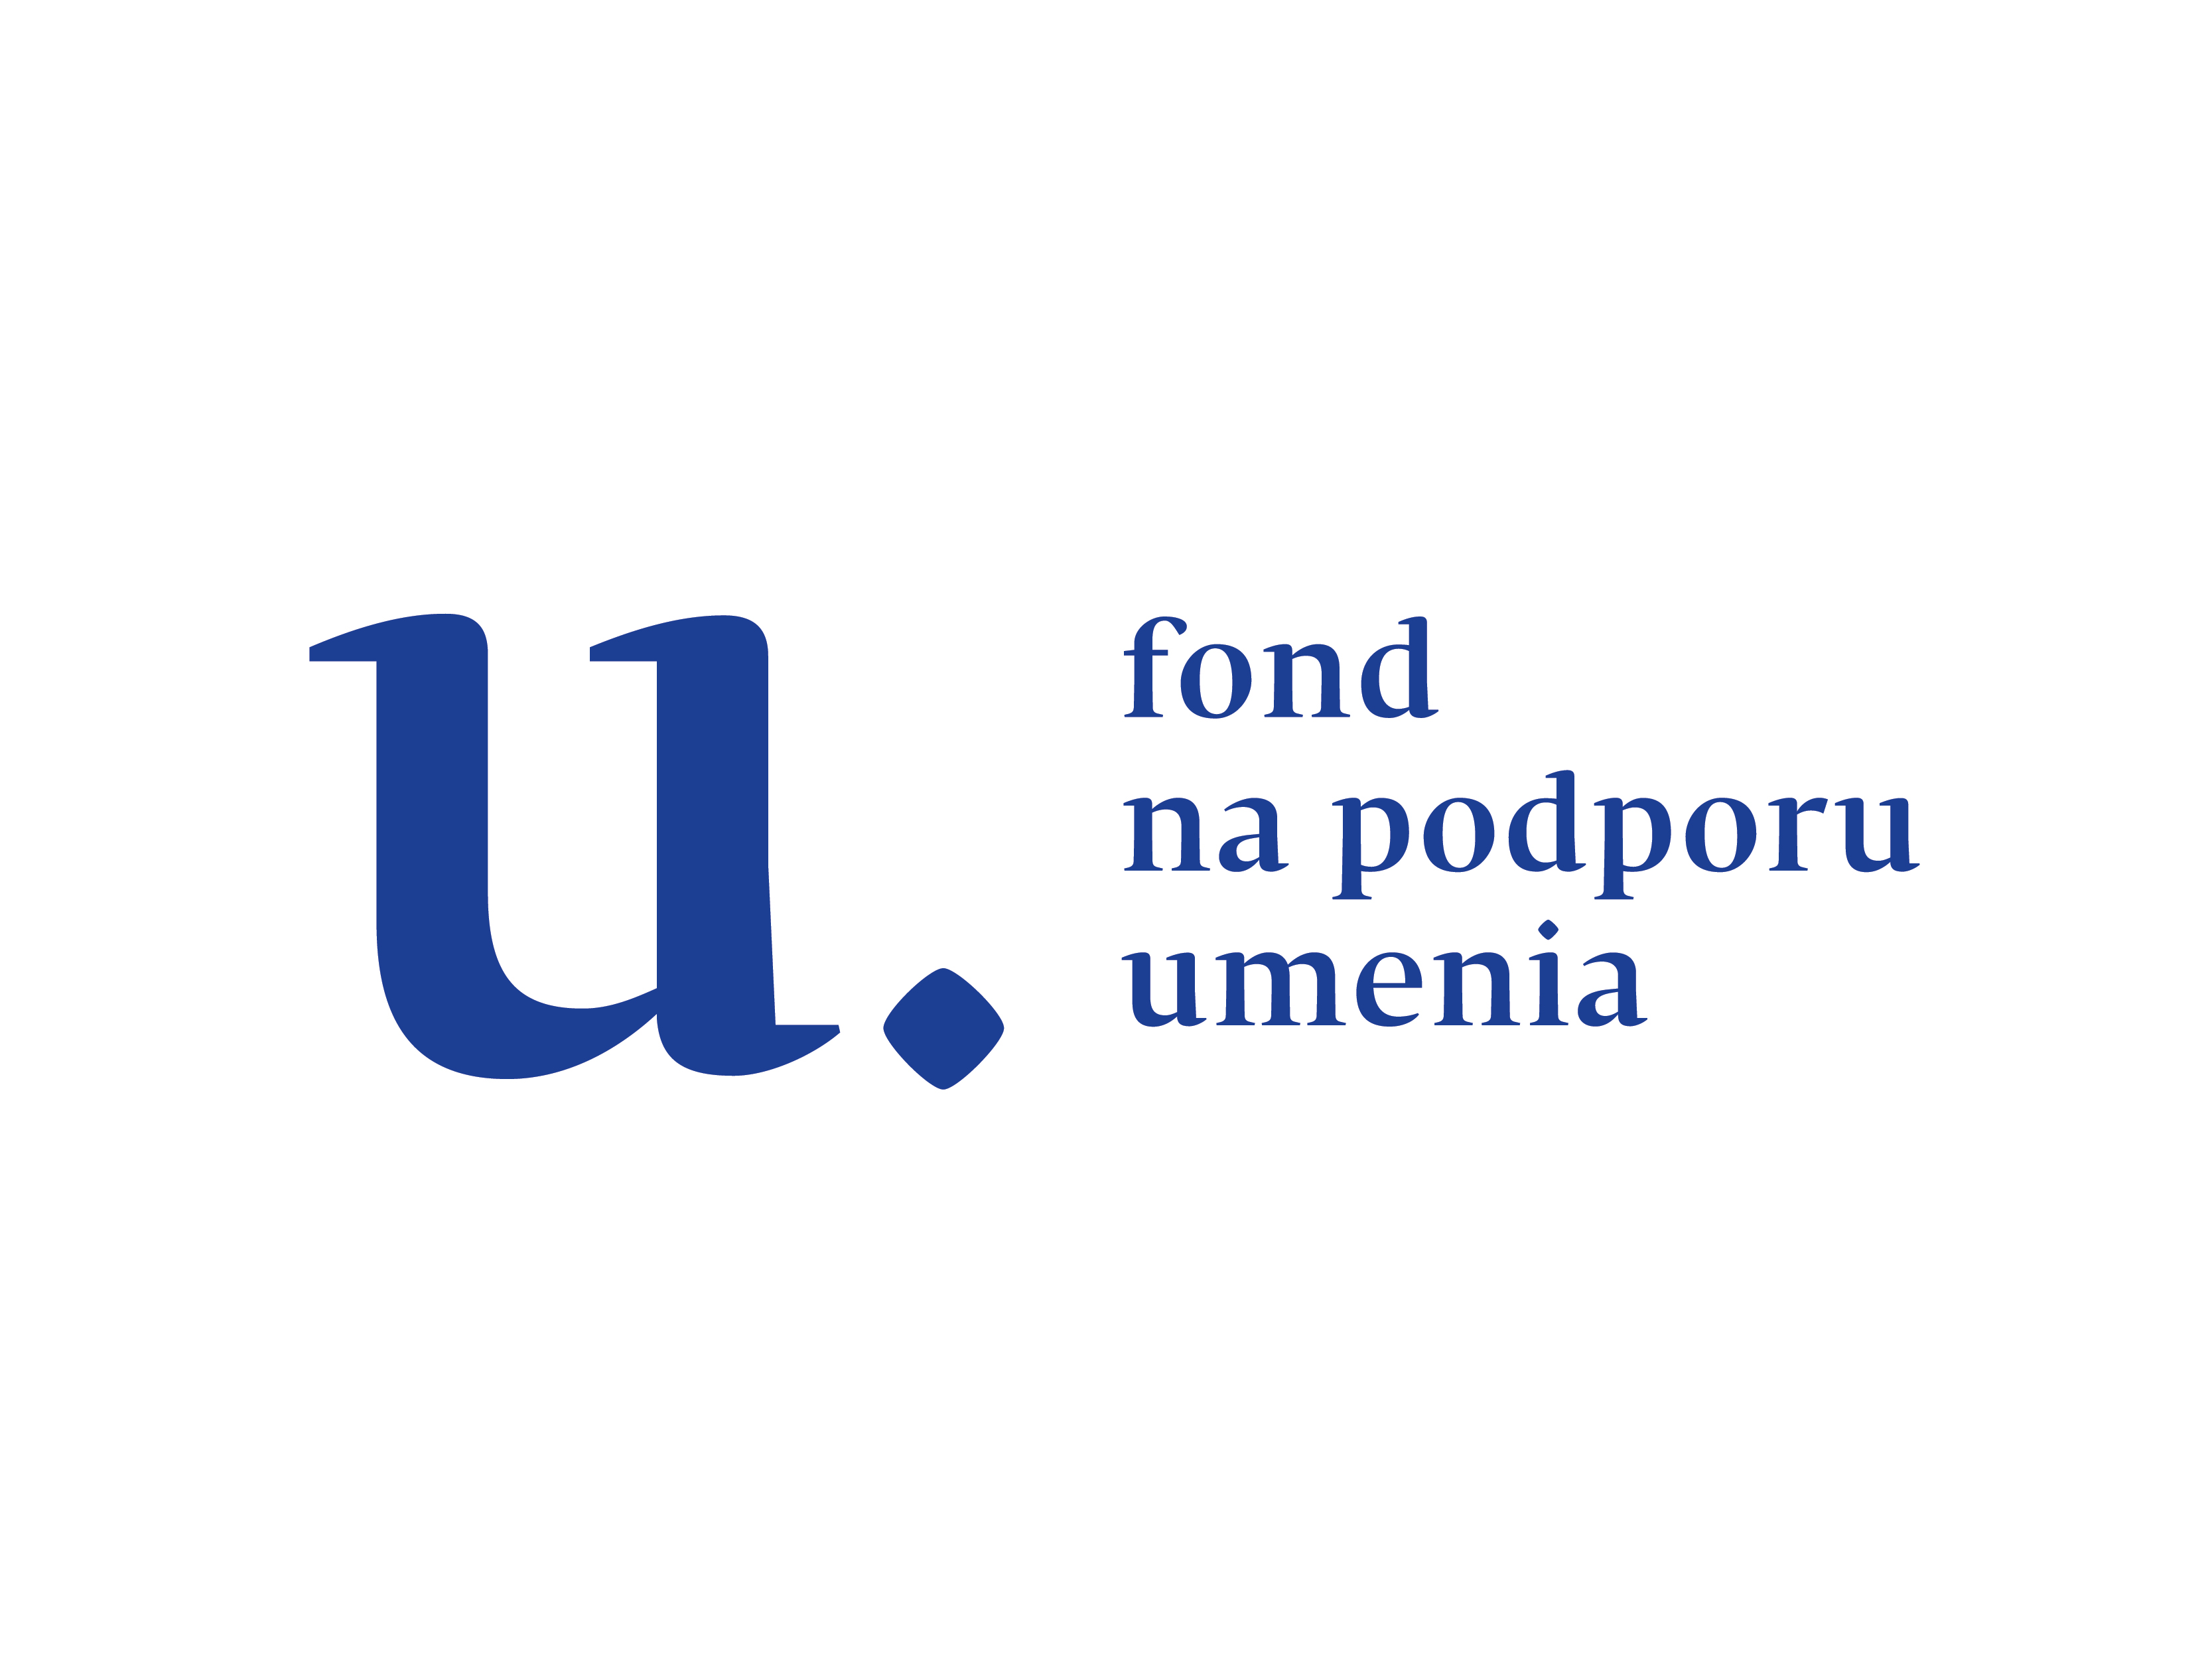 http://www.kniznicapetrzalka.sk/wp-content/uploads/2015/08/FPU_logo1_modre.jpg